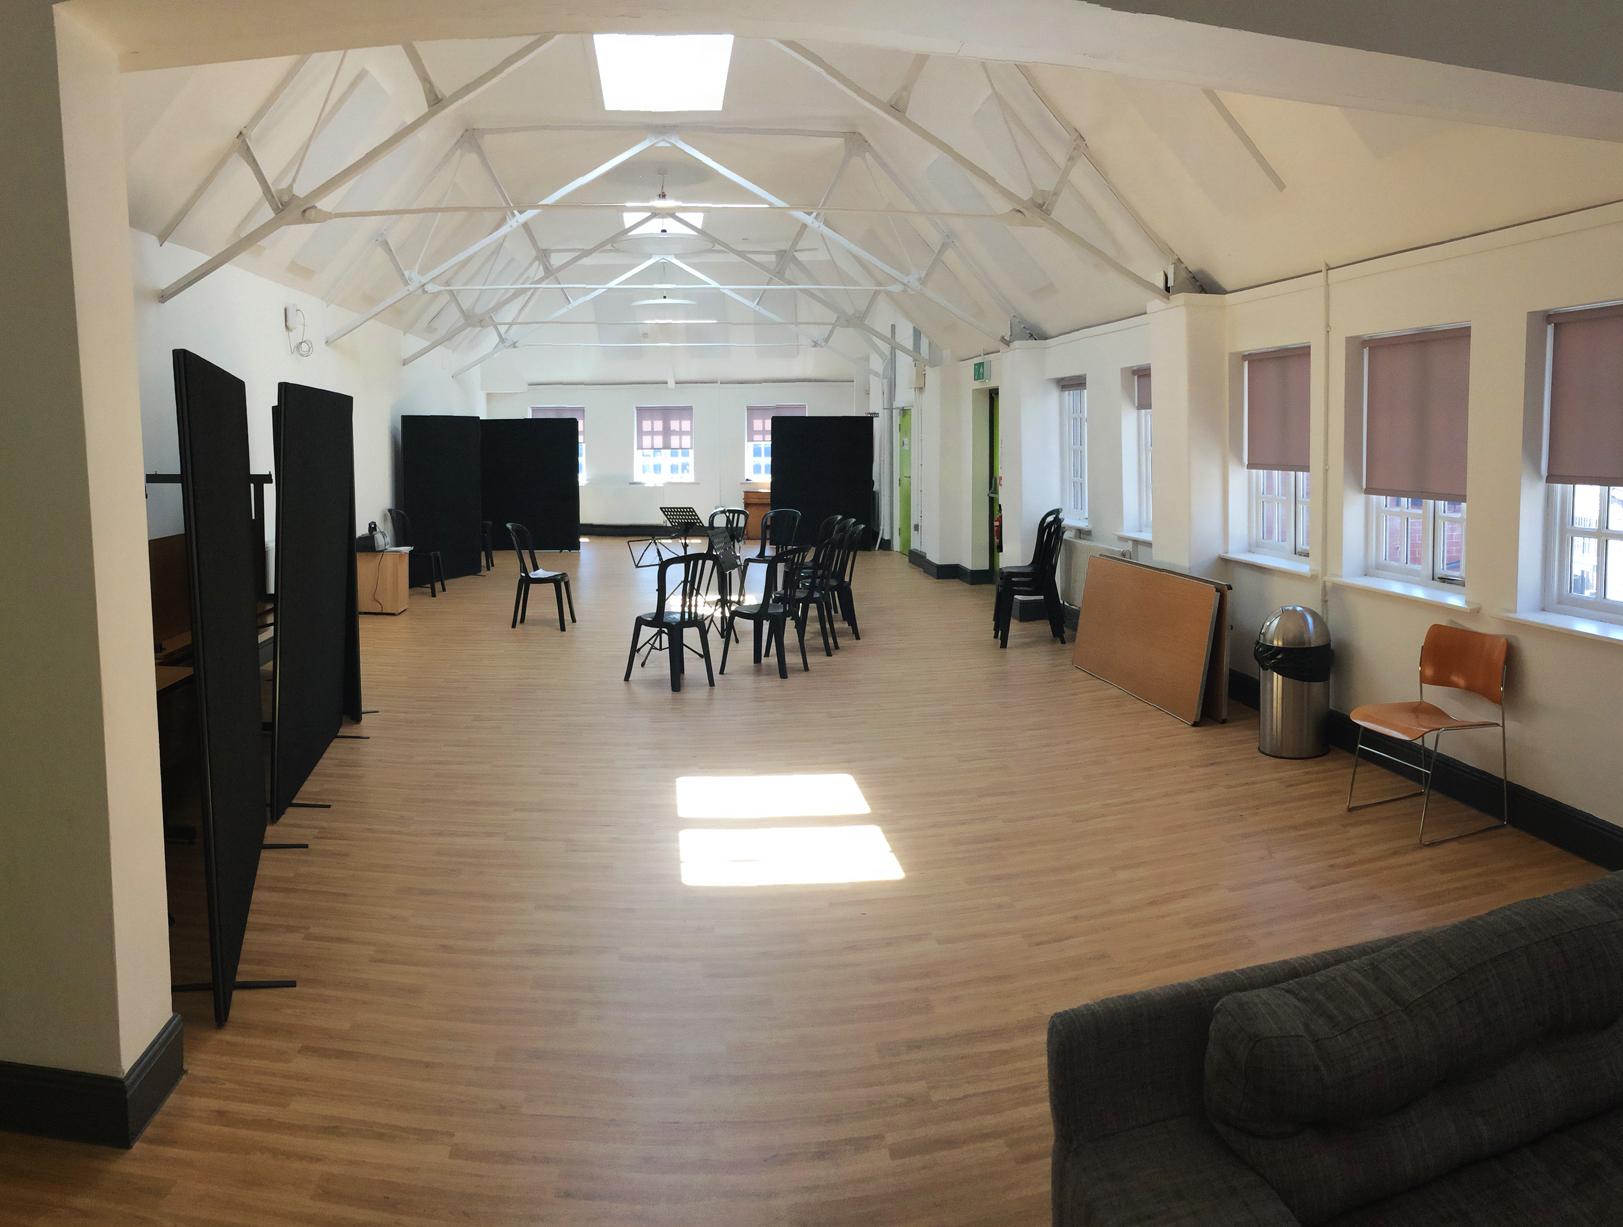 RehearsalSpace.jpg